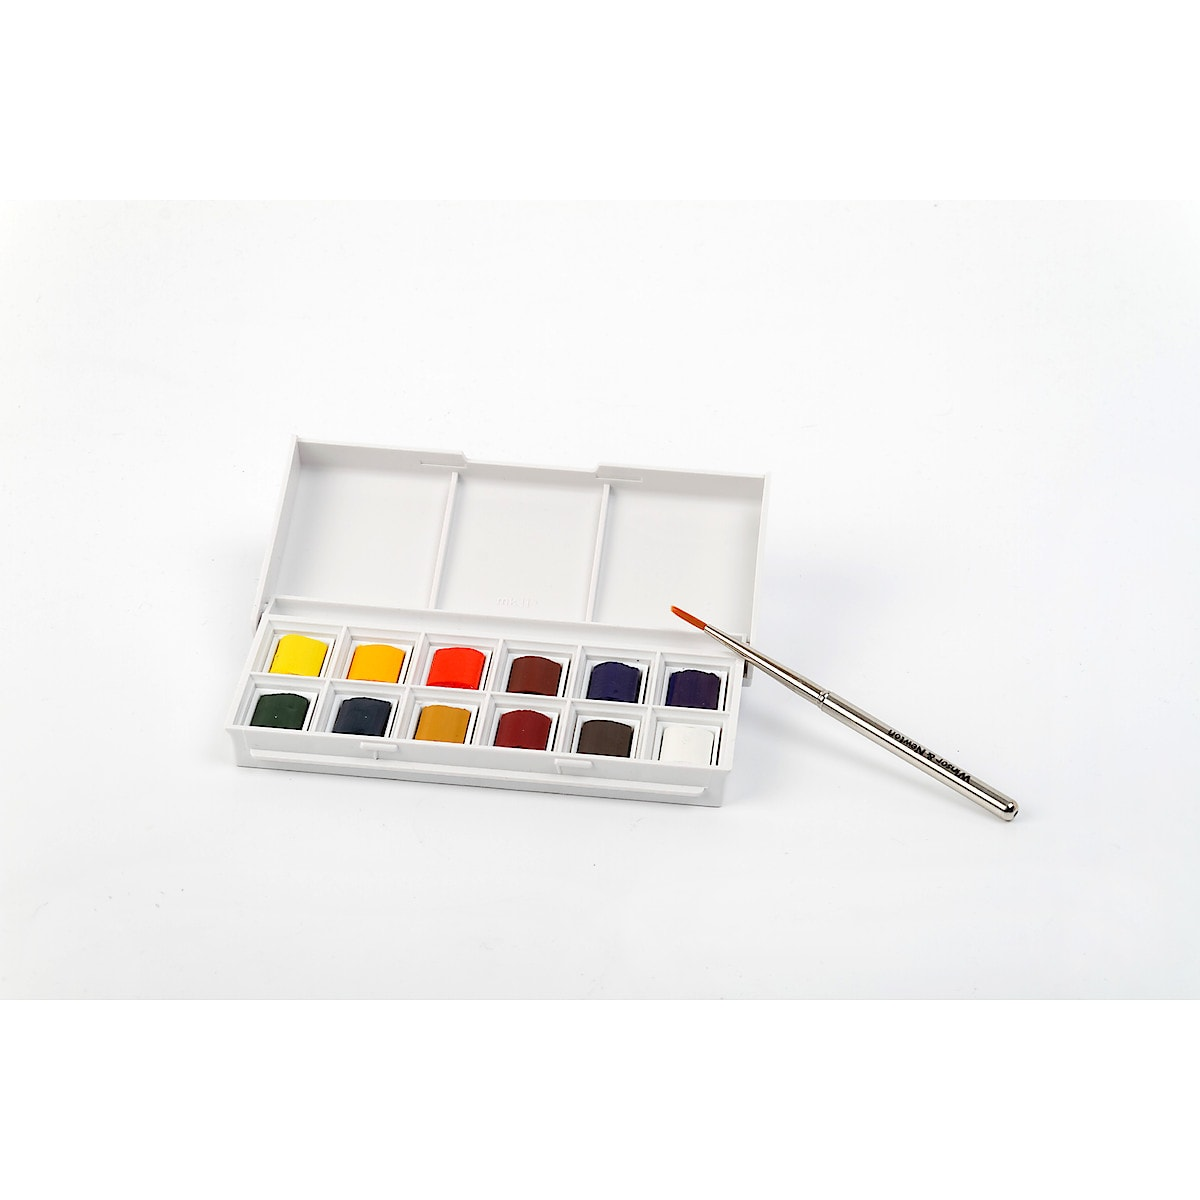 Akvarellfärgssats Winsor & Newton